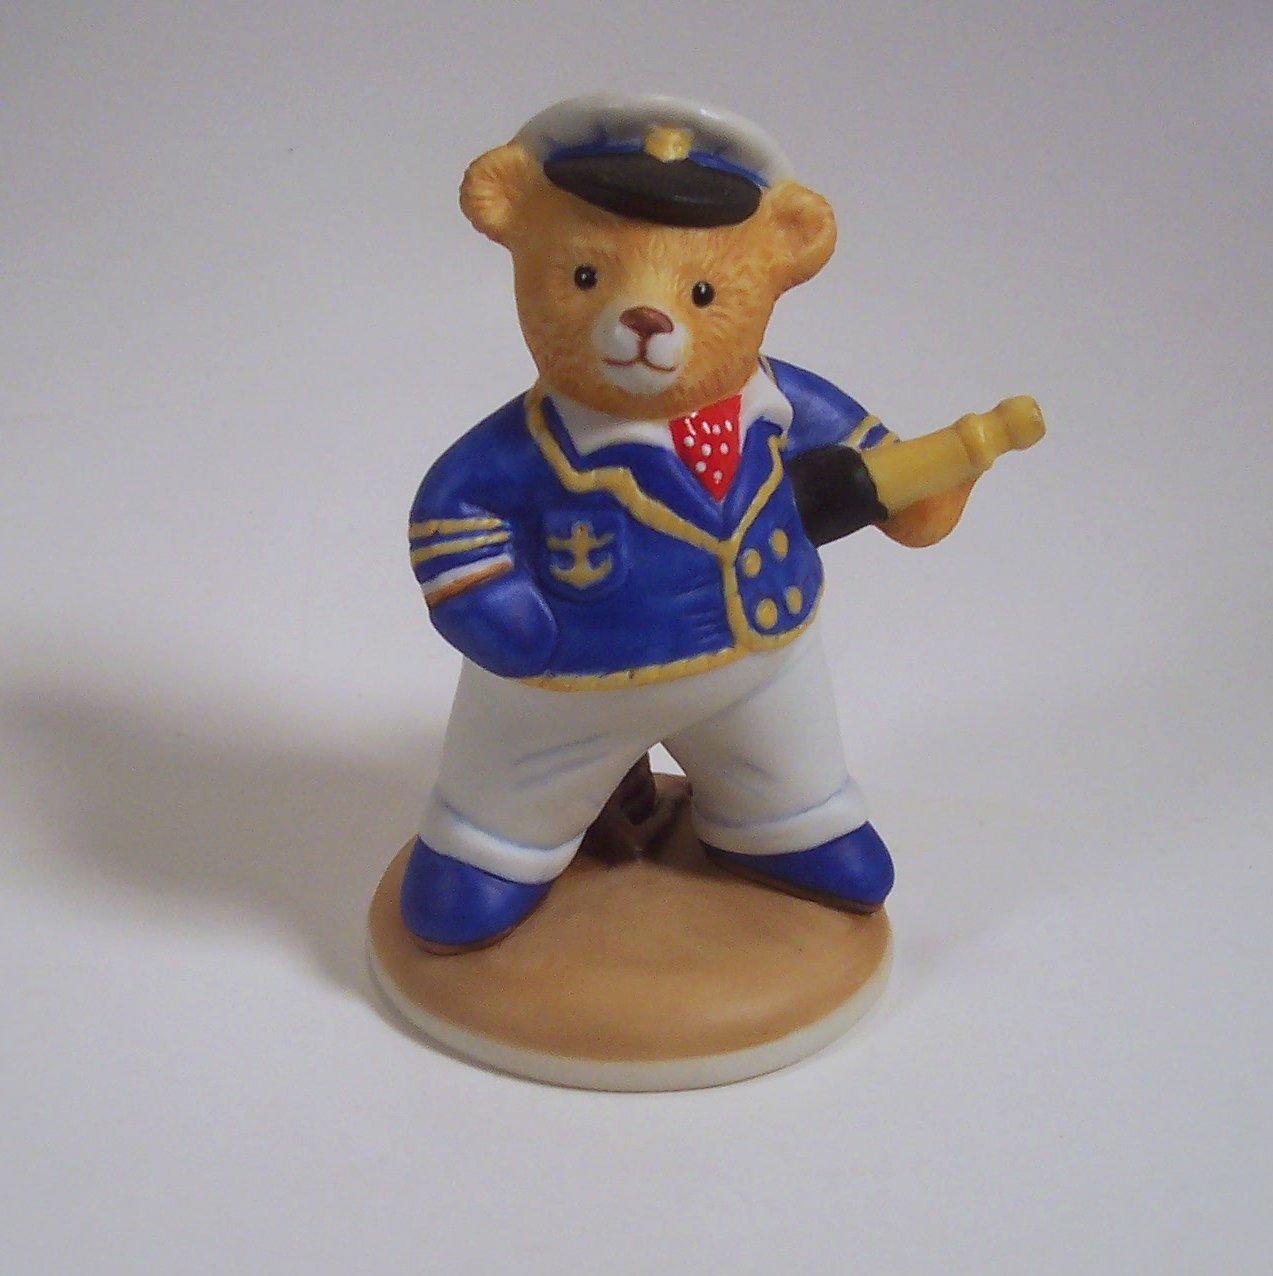 Commander Teddington Teddington Hotel 1986 Franklin Mint Porcelain Figurine